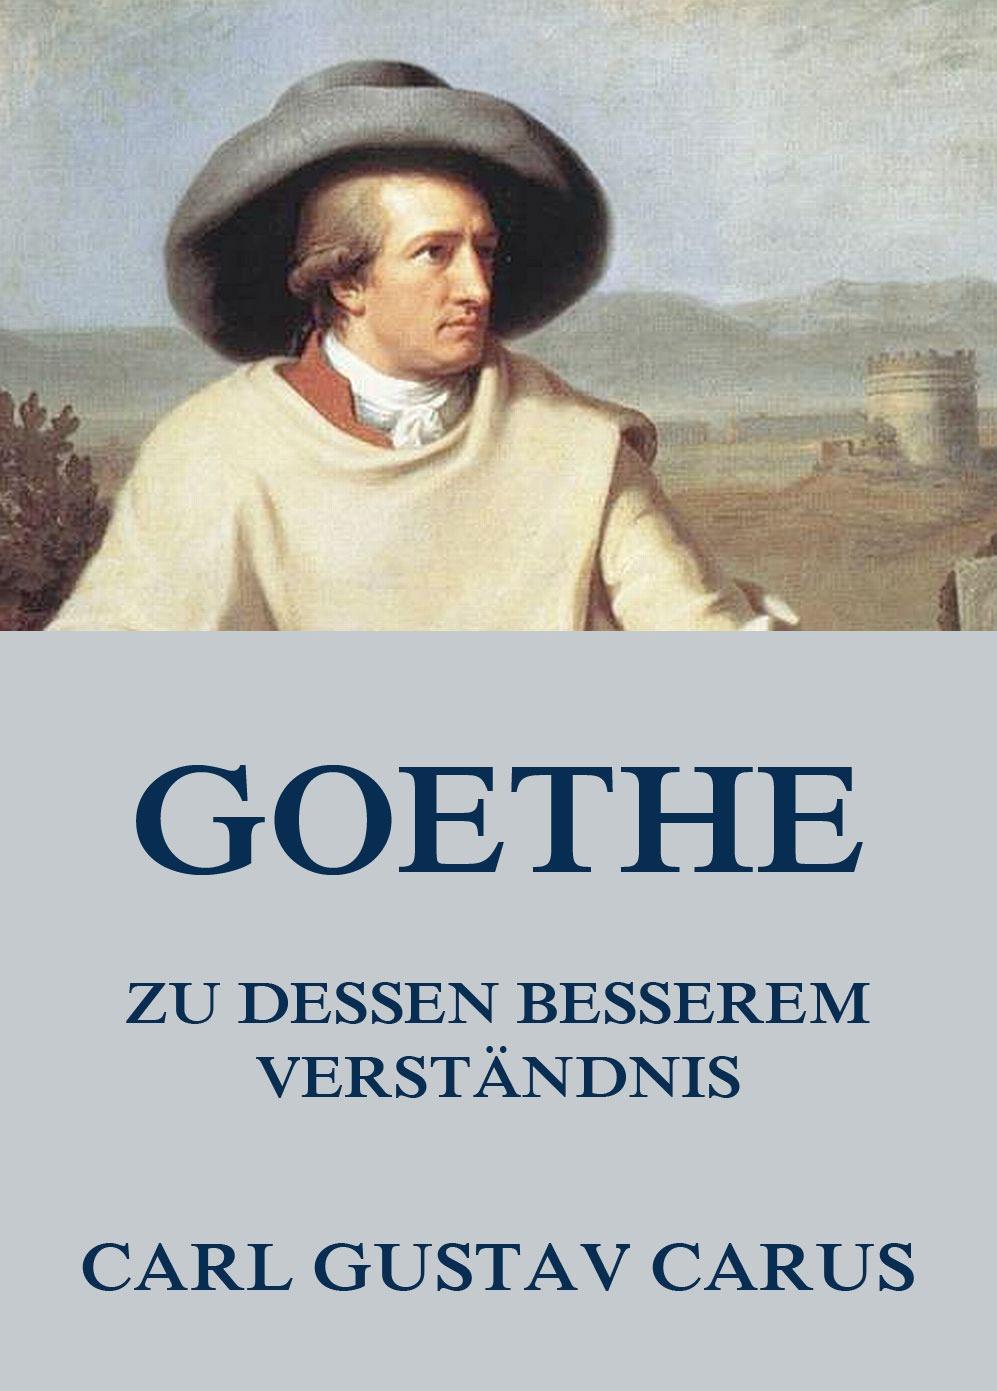 Carl Gustav Carus Goethe, zu dessen besserem Verständnis leo koenigsberger carl gustav jacob jacobi